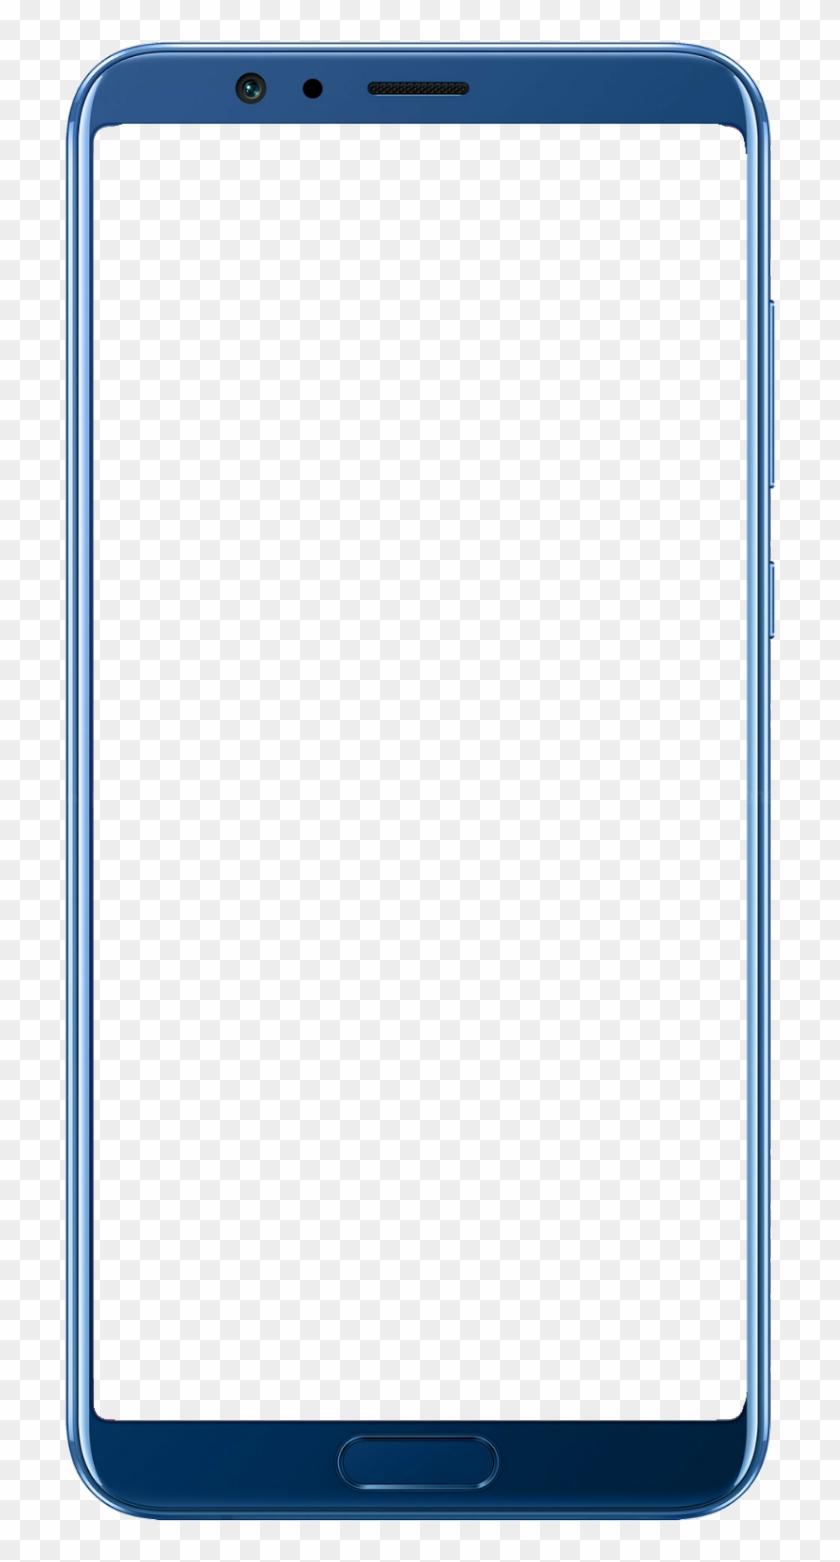 Mobile Png Clipart - Png Mobile Frame Download Transparent Png #37352